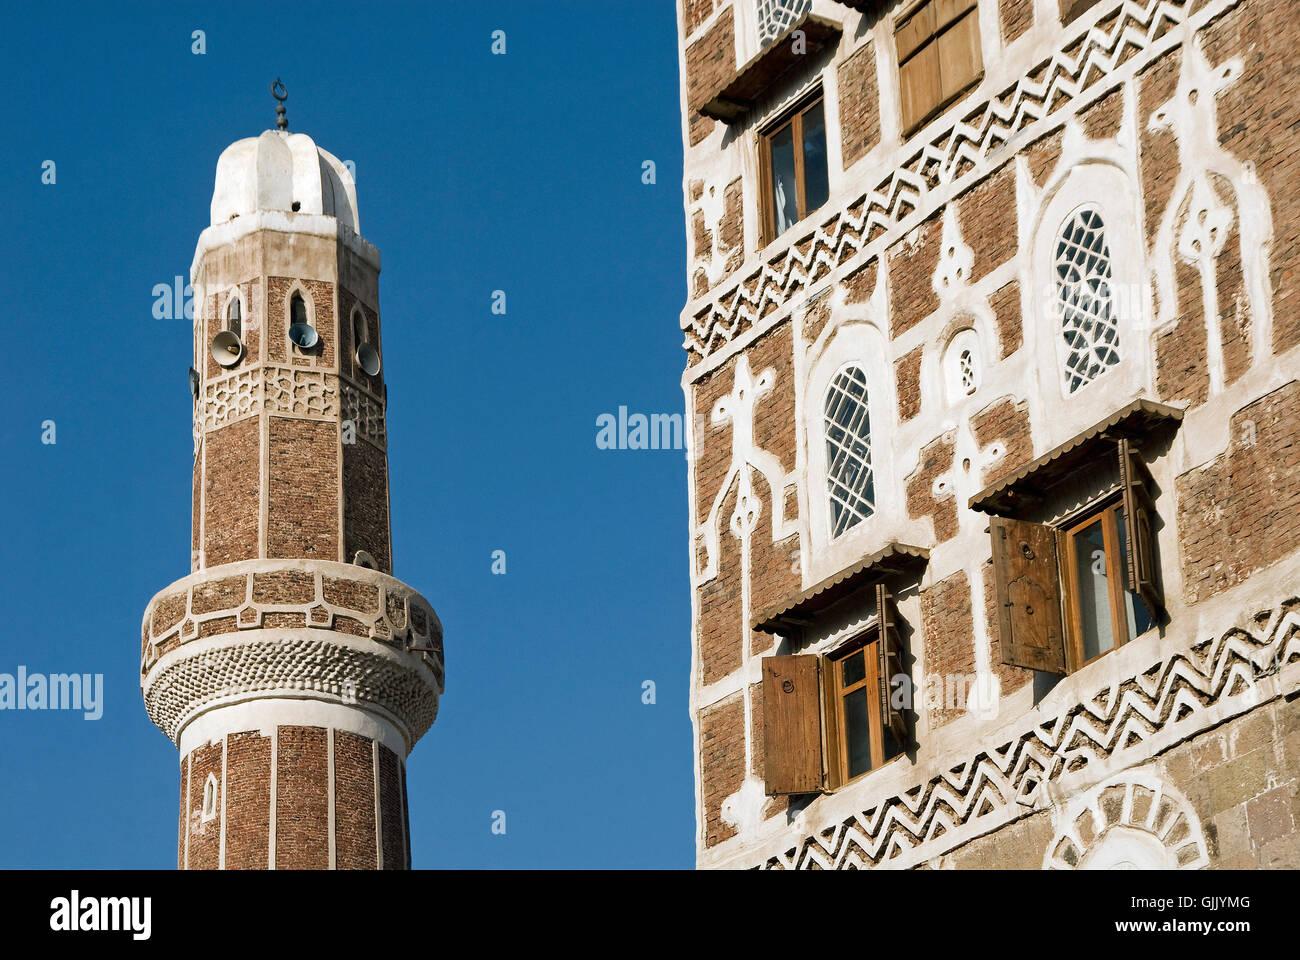 islam in yemen - Stock Image